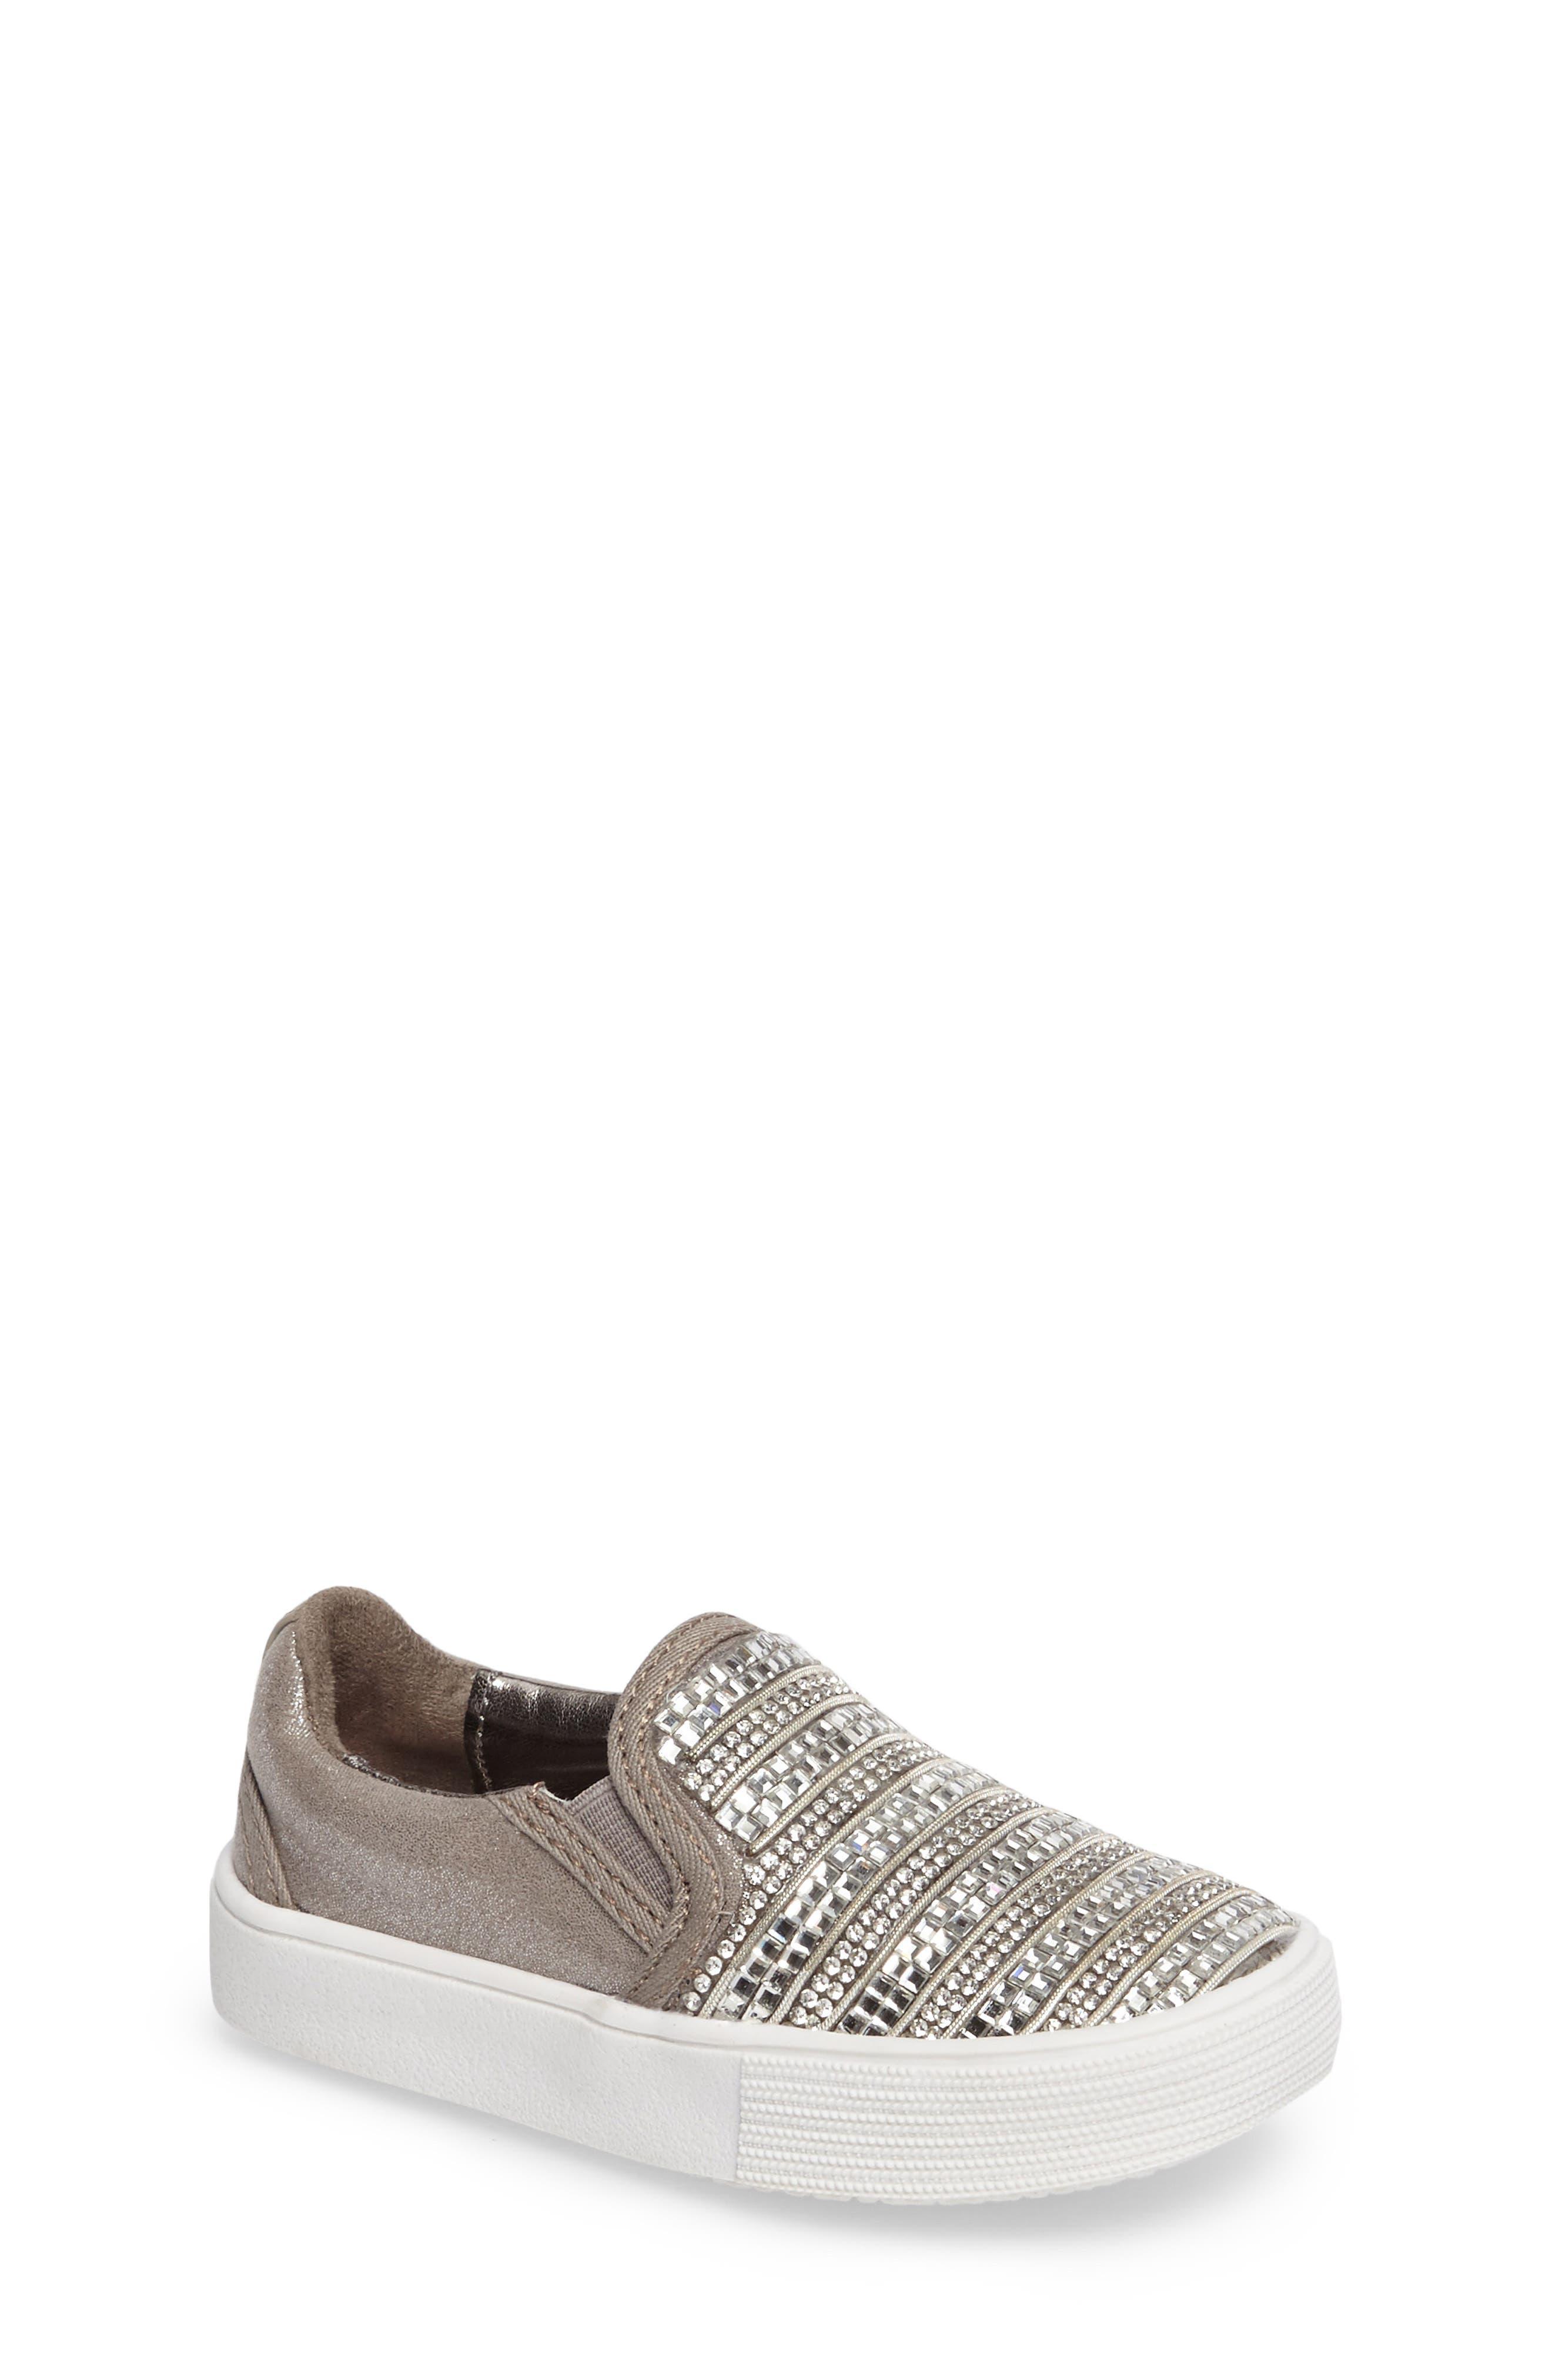 Main Image - Stuart Weitzman Vance Glitz Embellished Slip-On Sneaker (Walker & Toddler)